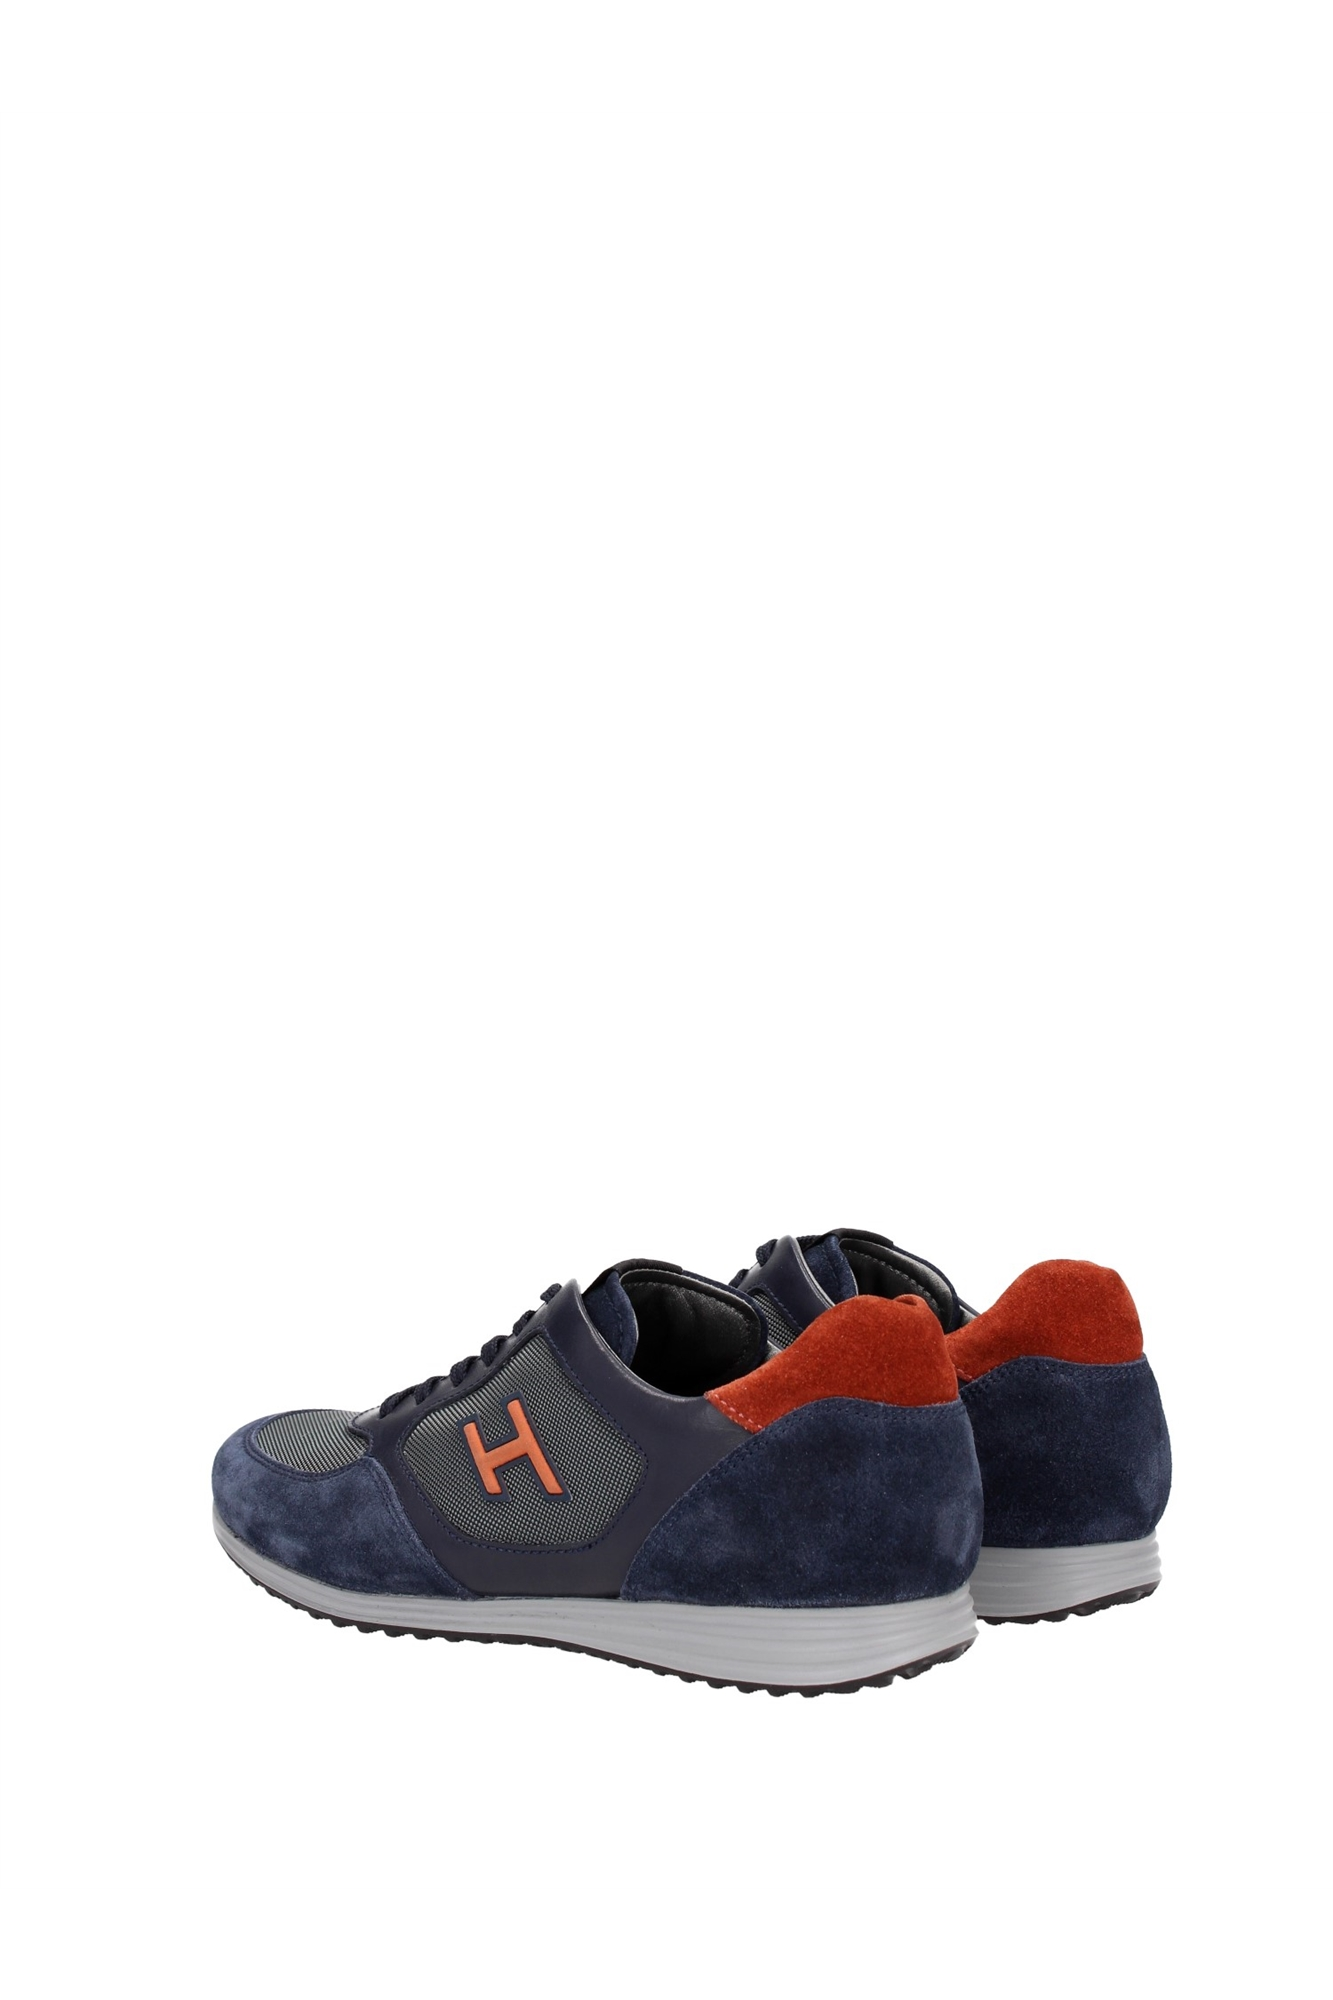 sneakers hogan herren wildleder blau hxm2050q1519e0523t ebay. Black Bedroom Furniture Sets. Home Design Ideas